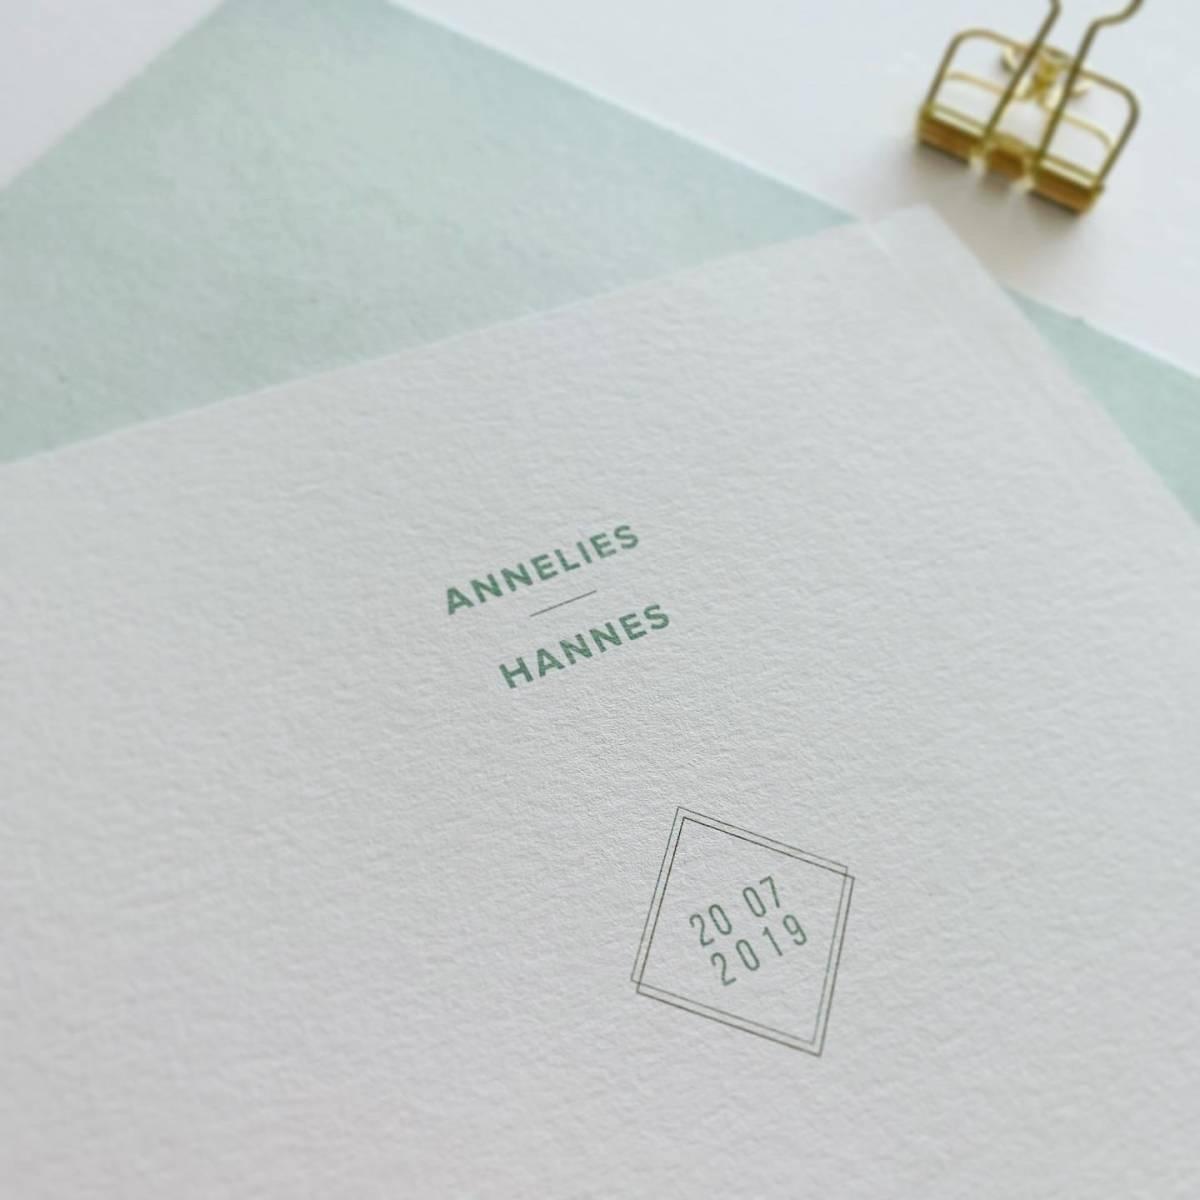 Scarabar - Trouwuitnodiging - Huwelijksuitnodiging - Drukwerk - Huwelijk - Trouw - Bruiloft - House of Weddings - 2